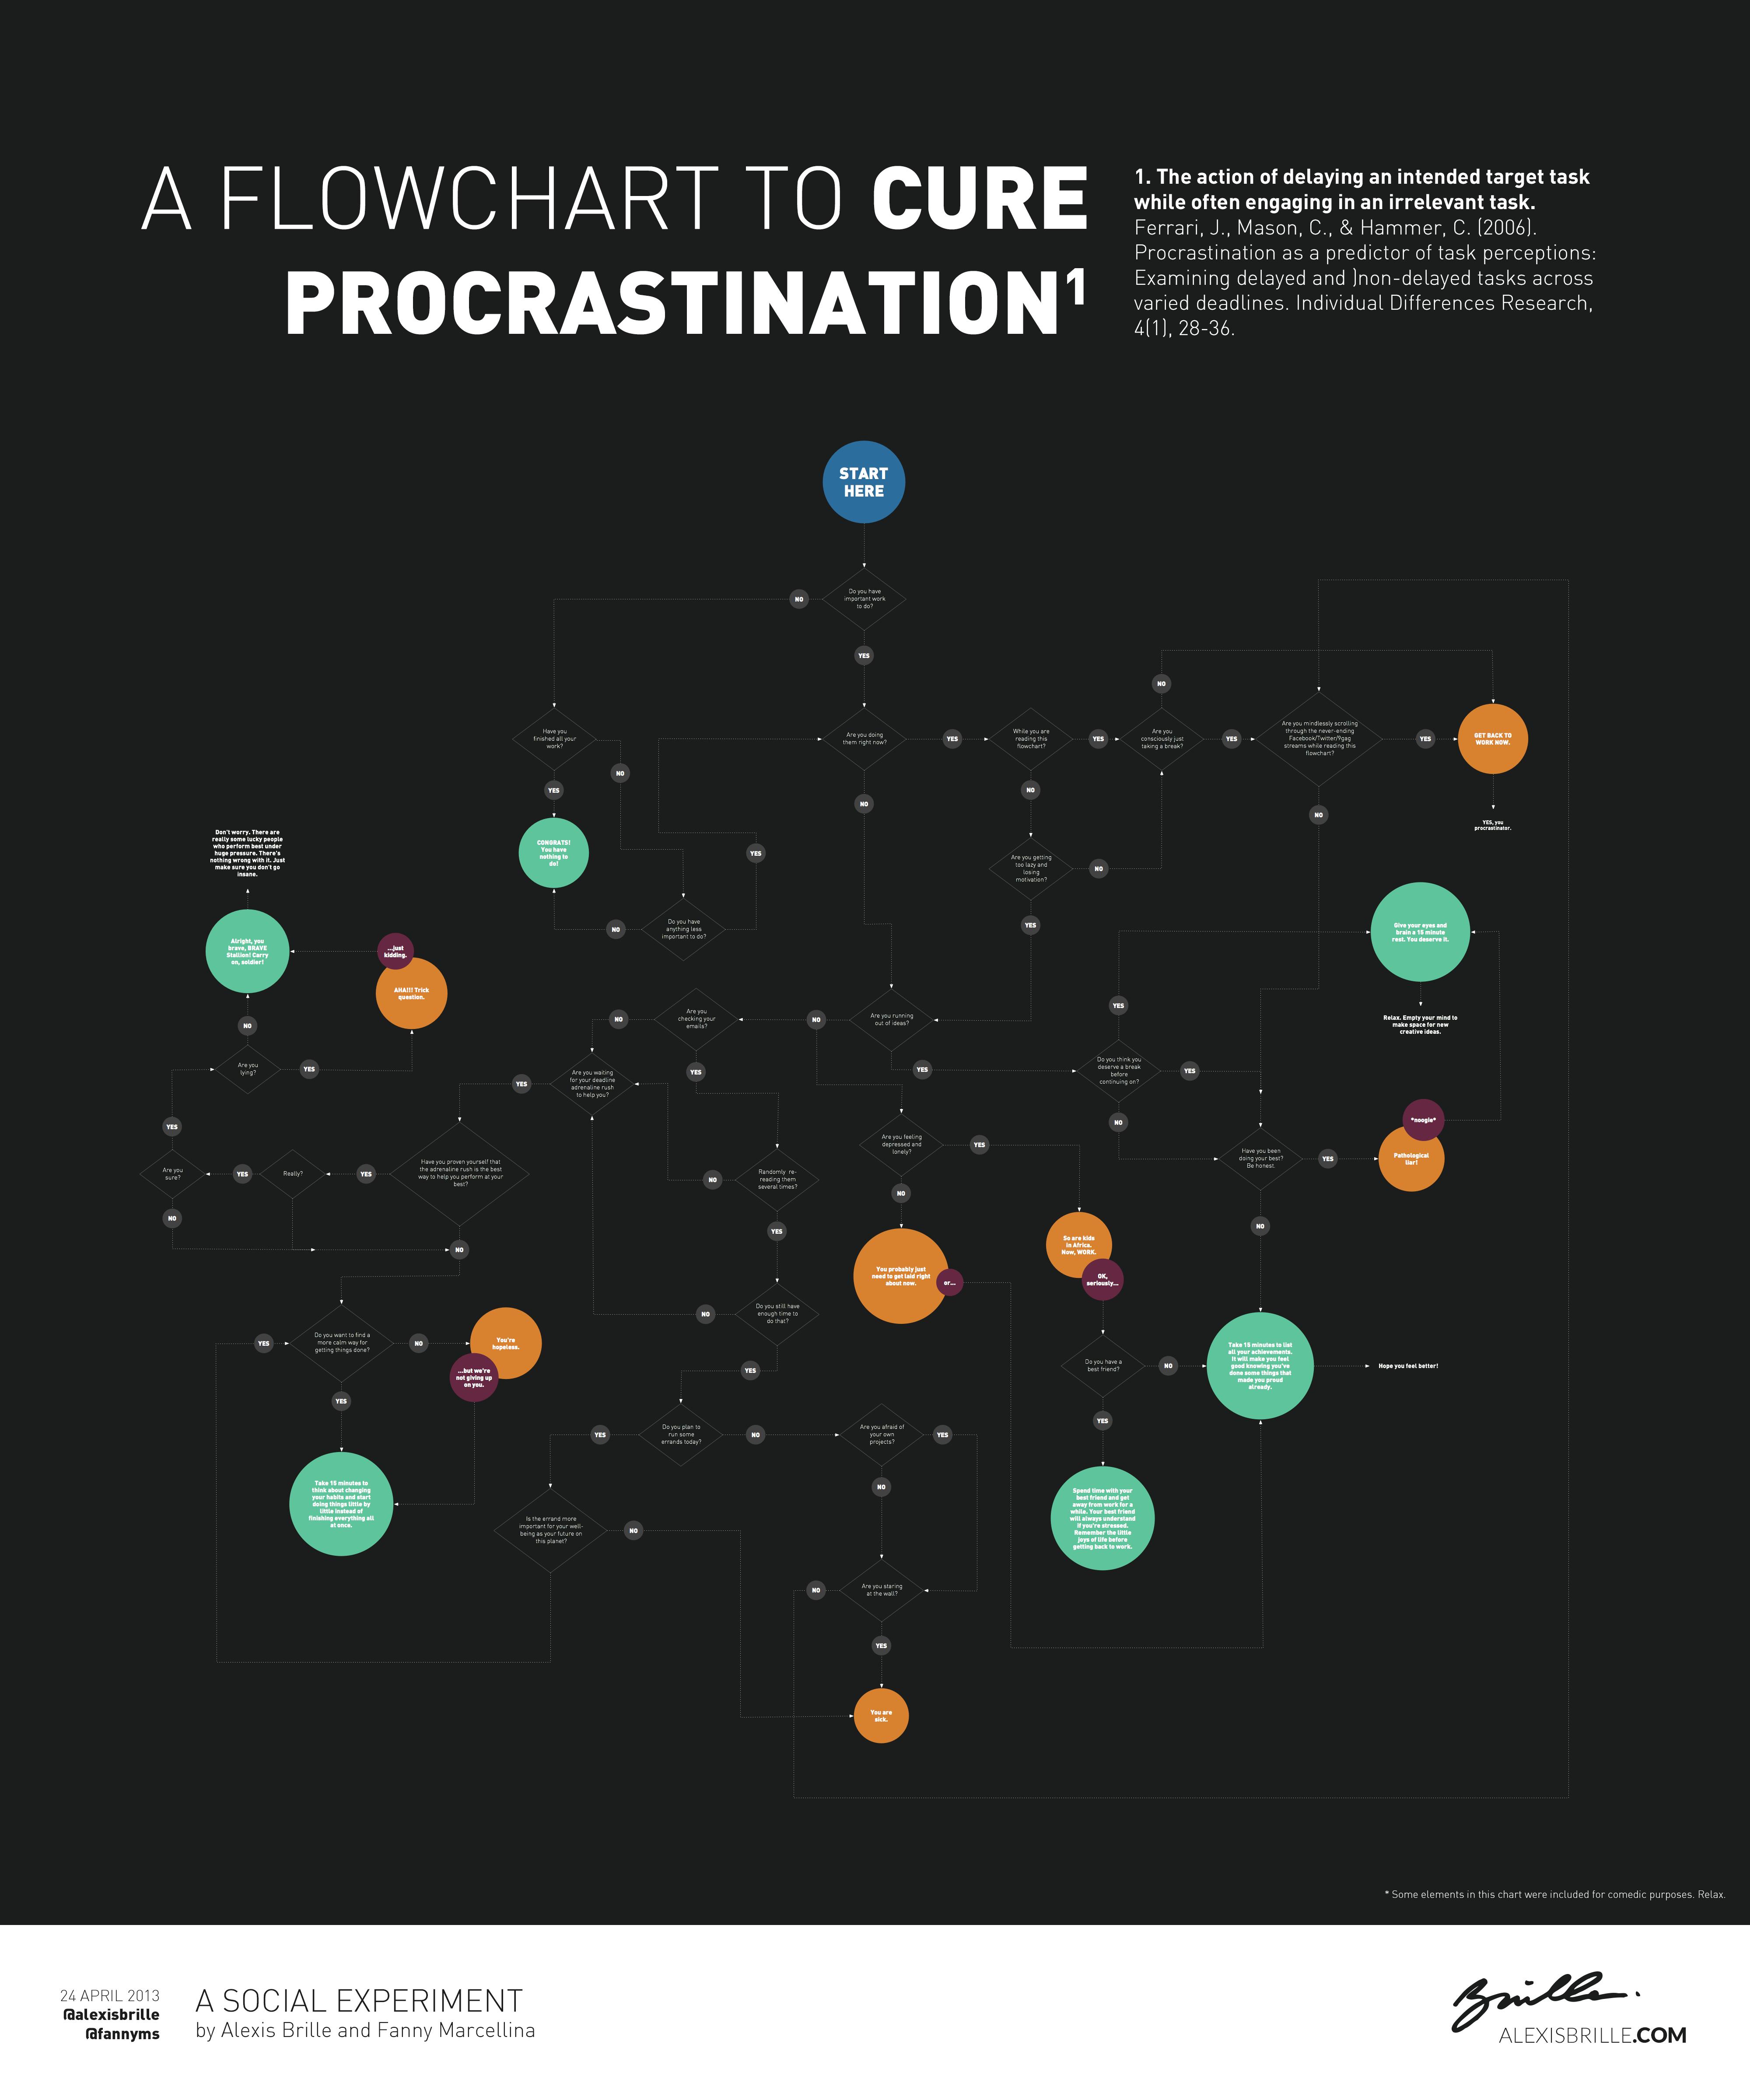 A Flowchart to Cure Procrastination